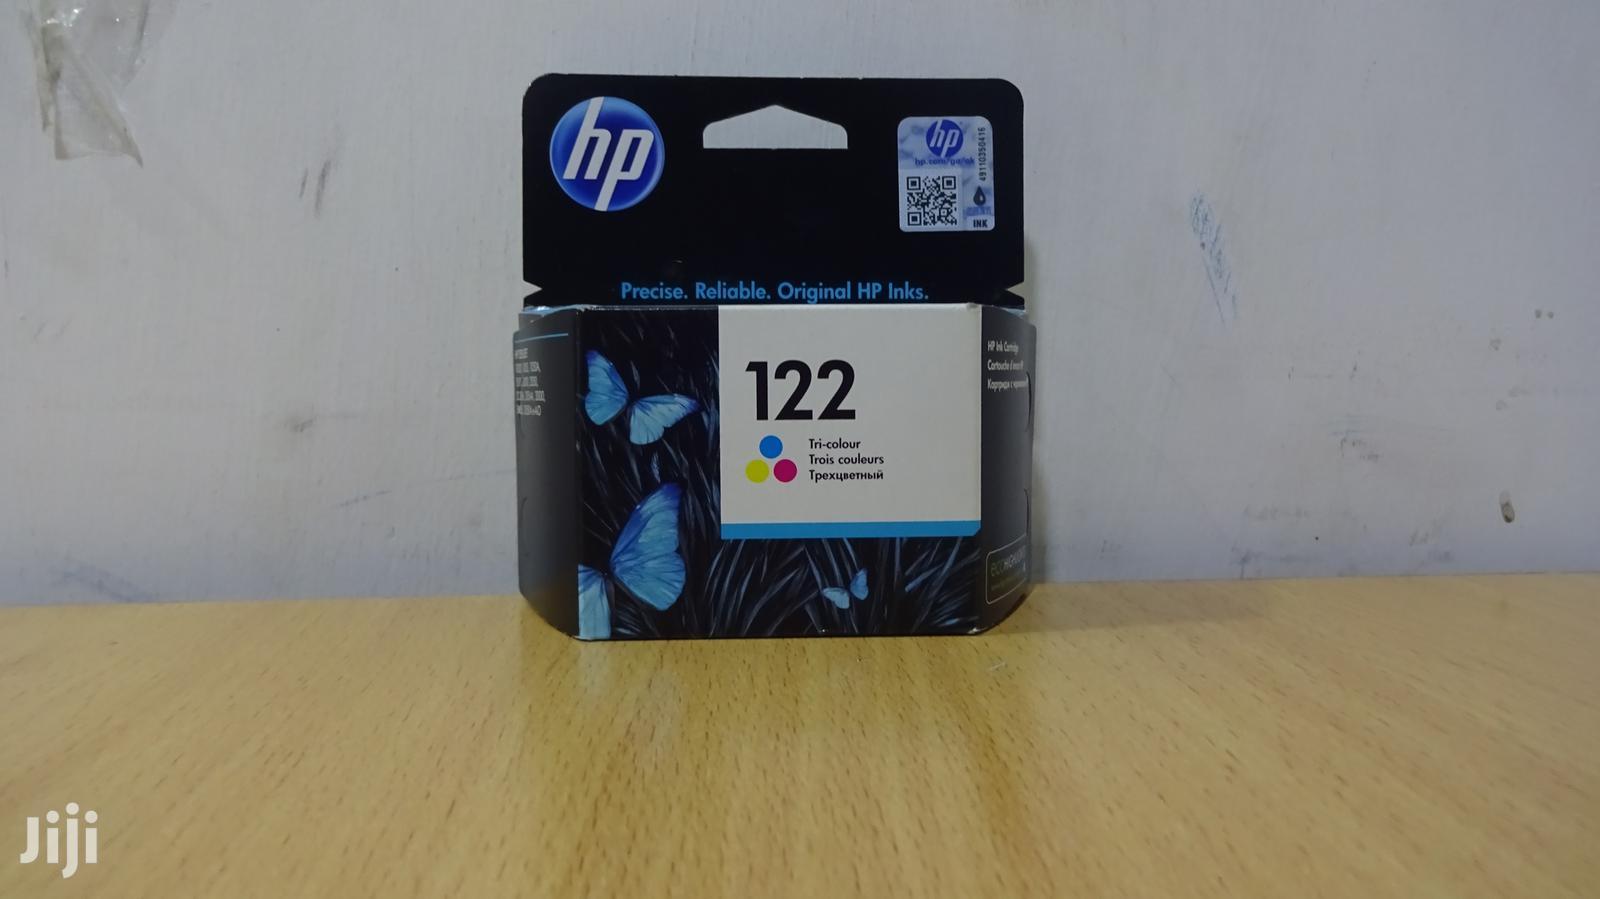 Archive: HP 122 Black Catridge